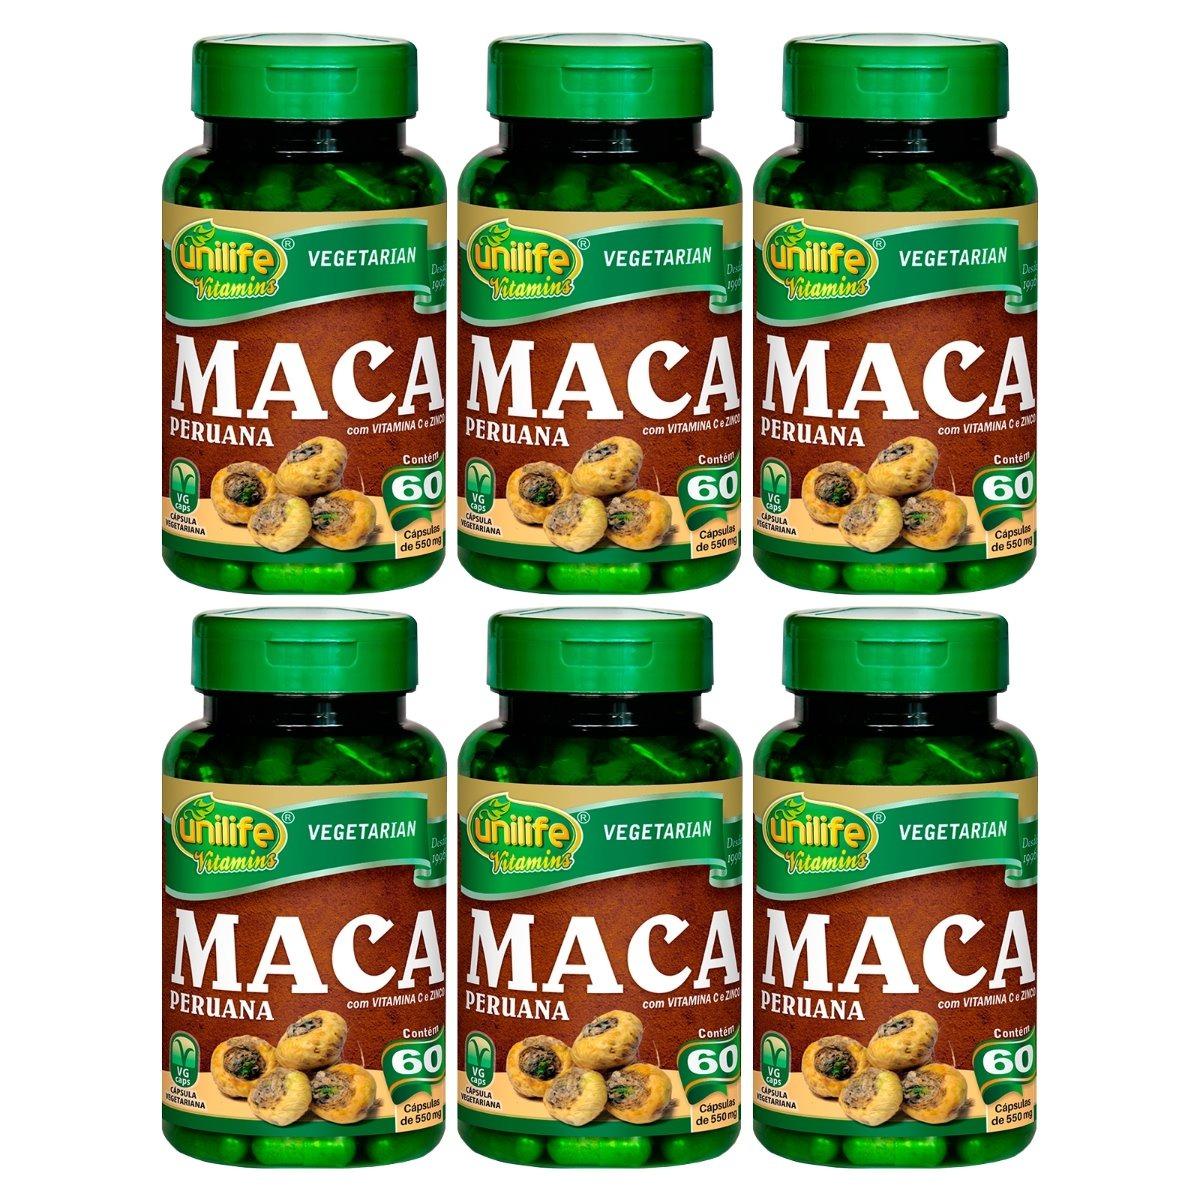 Maca Peruana Com Vitaminas 60 Cápsulas Unilife Kit 6 Unidades